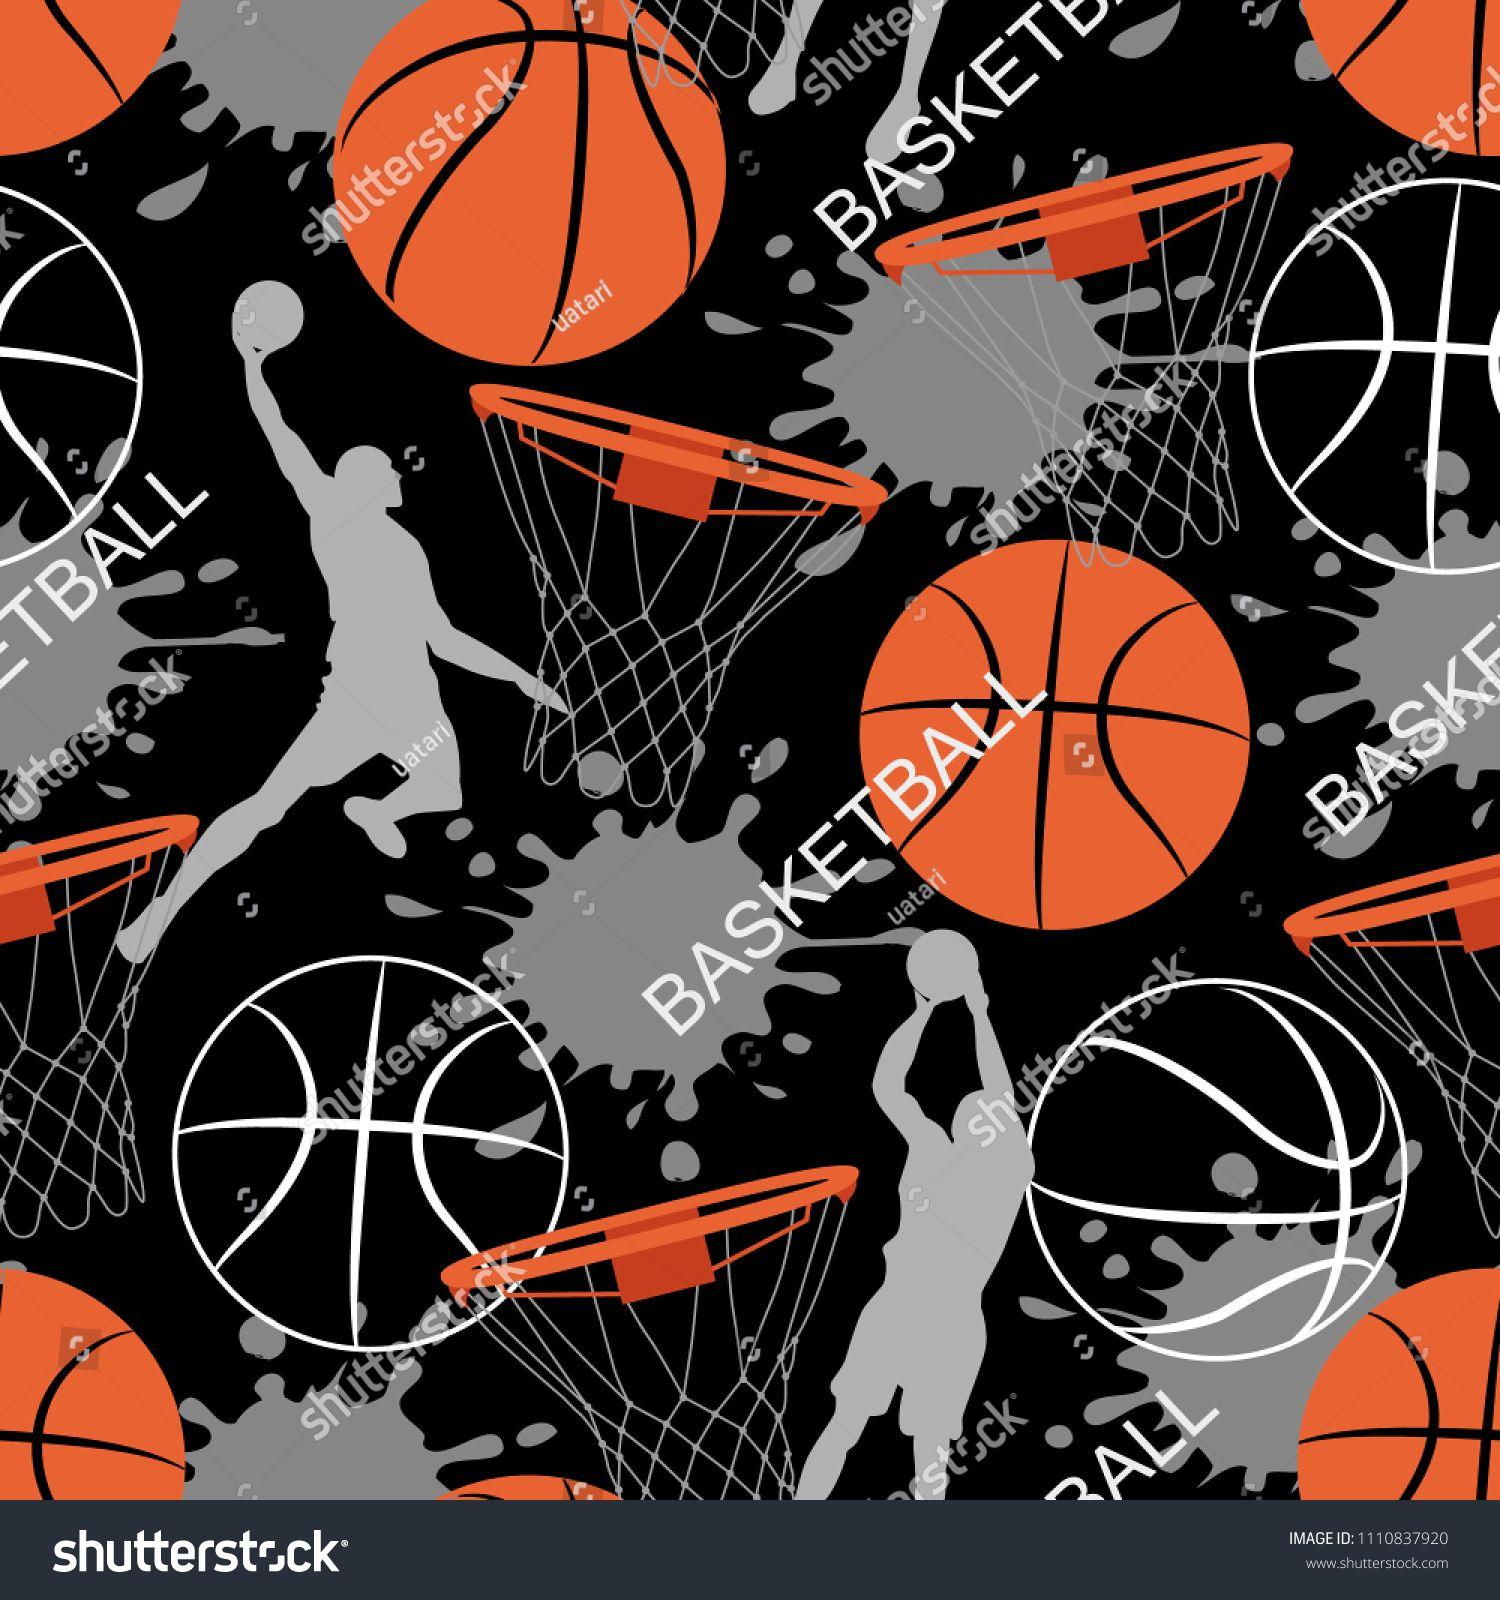 Basketball Game Seamless Pattern Sports Abstract Background Basket Balls Texture Seamless Sport P Seamless Patterns Abstract Backgrounds Background Patterns